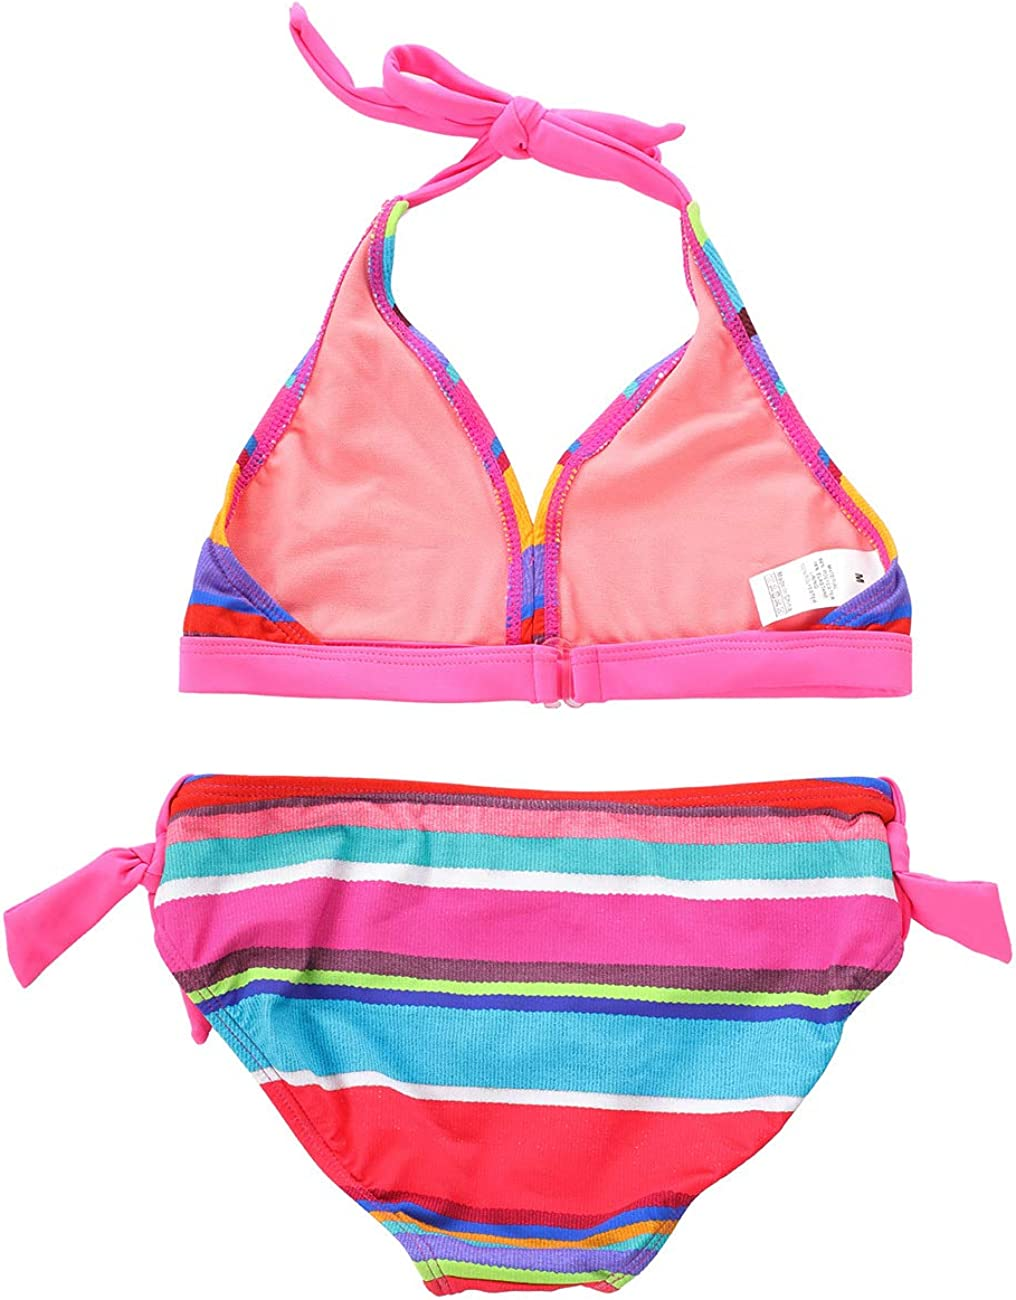 DUSISHIDAN Bikini Girls Two-Piece Tankini Set Sling Printed Holiday Swimsuits Top with Bottom Beachwear for UK Age 6-14 Years